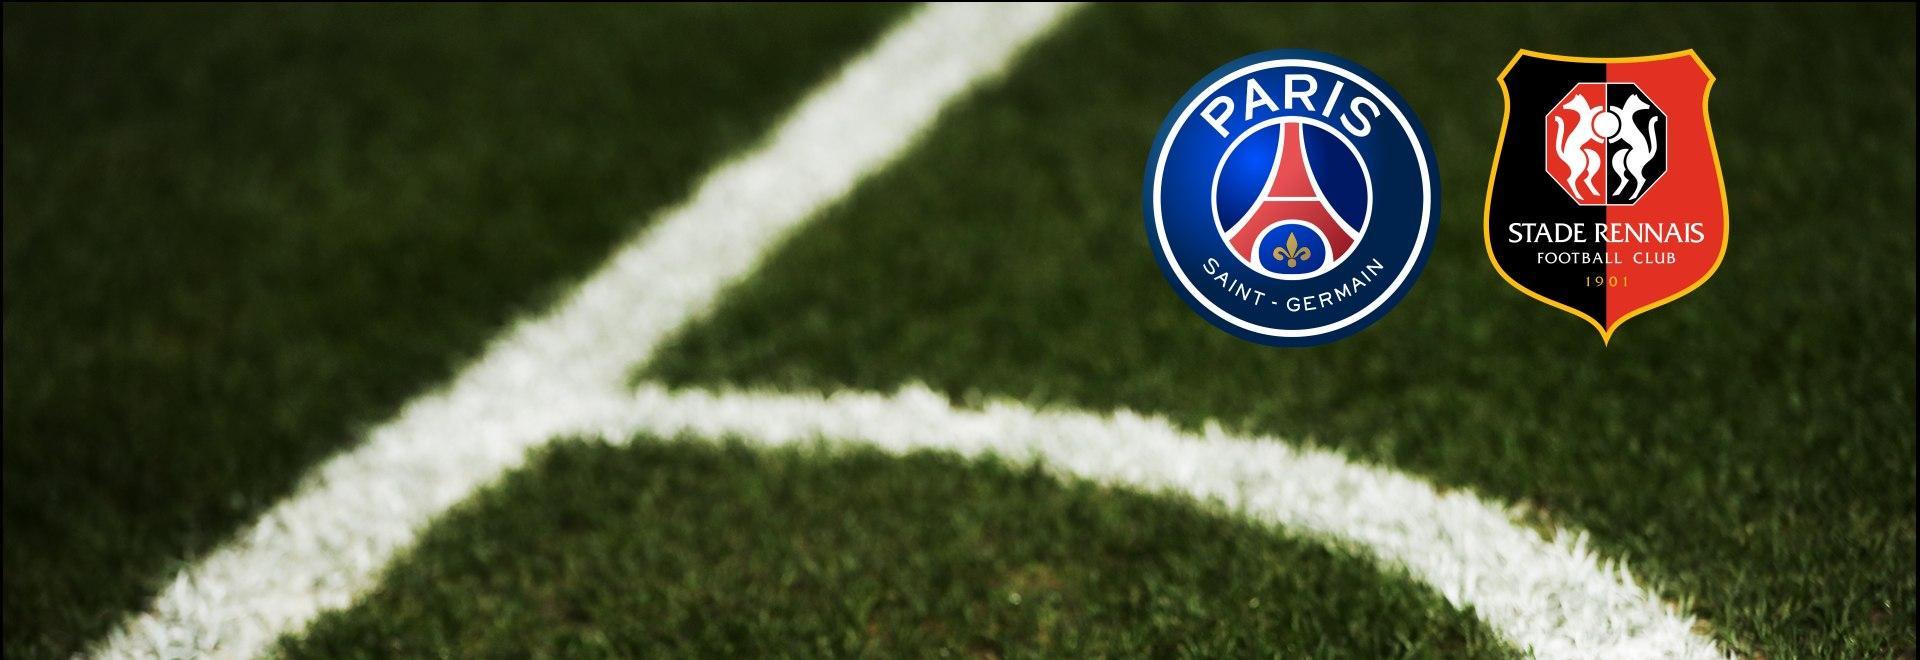 PSG - Rennes. 10a g.